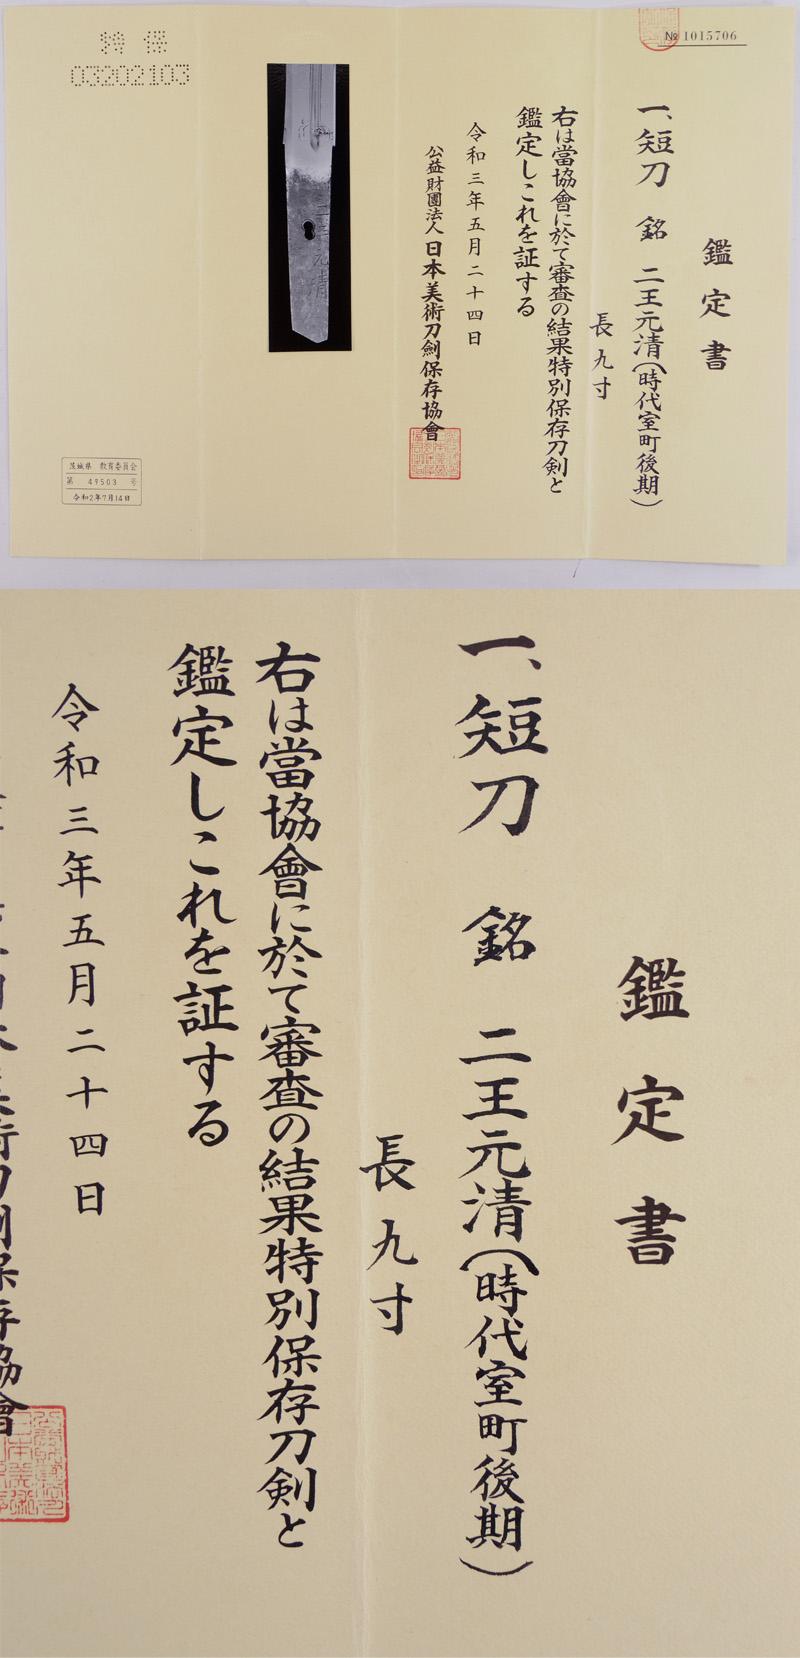 短刀 二王元清(時代室町後期) Picture of Certificate